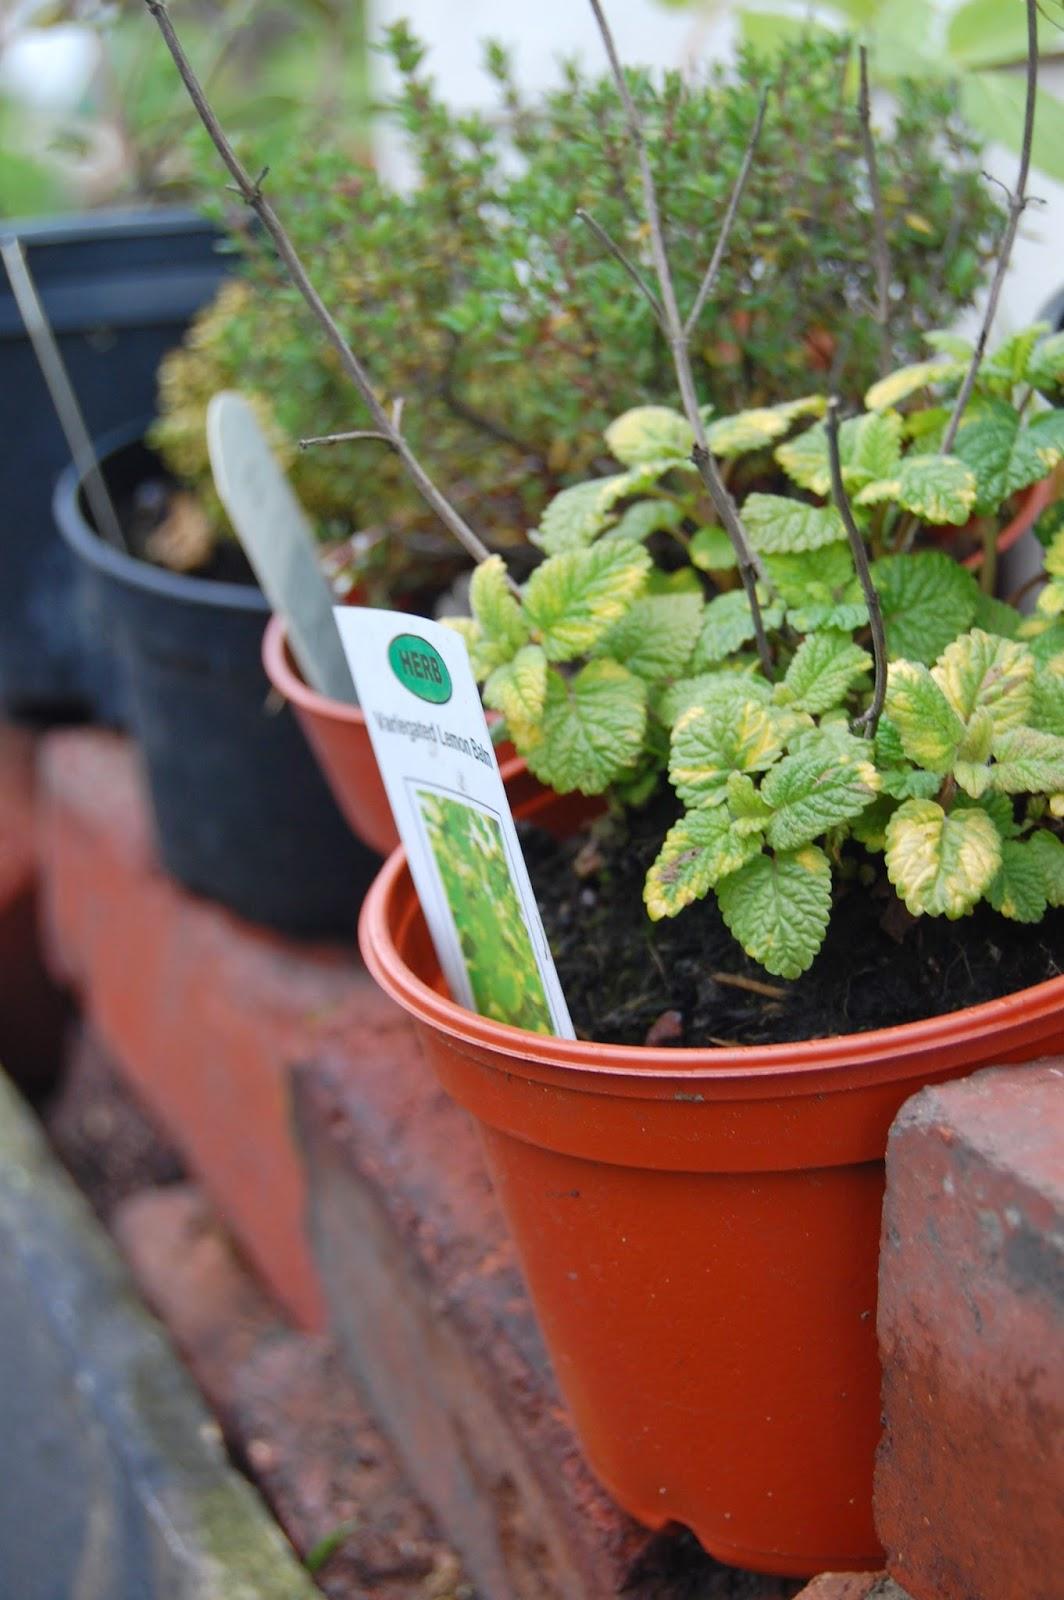 Herbs in pots on windowsills are a great harvest #lifeonpigrow